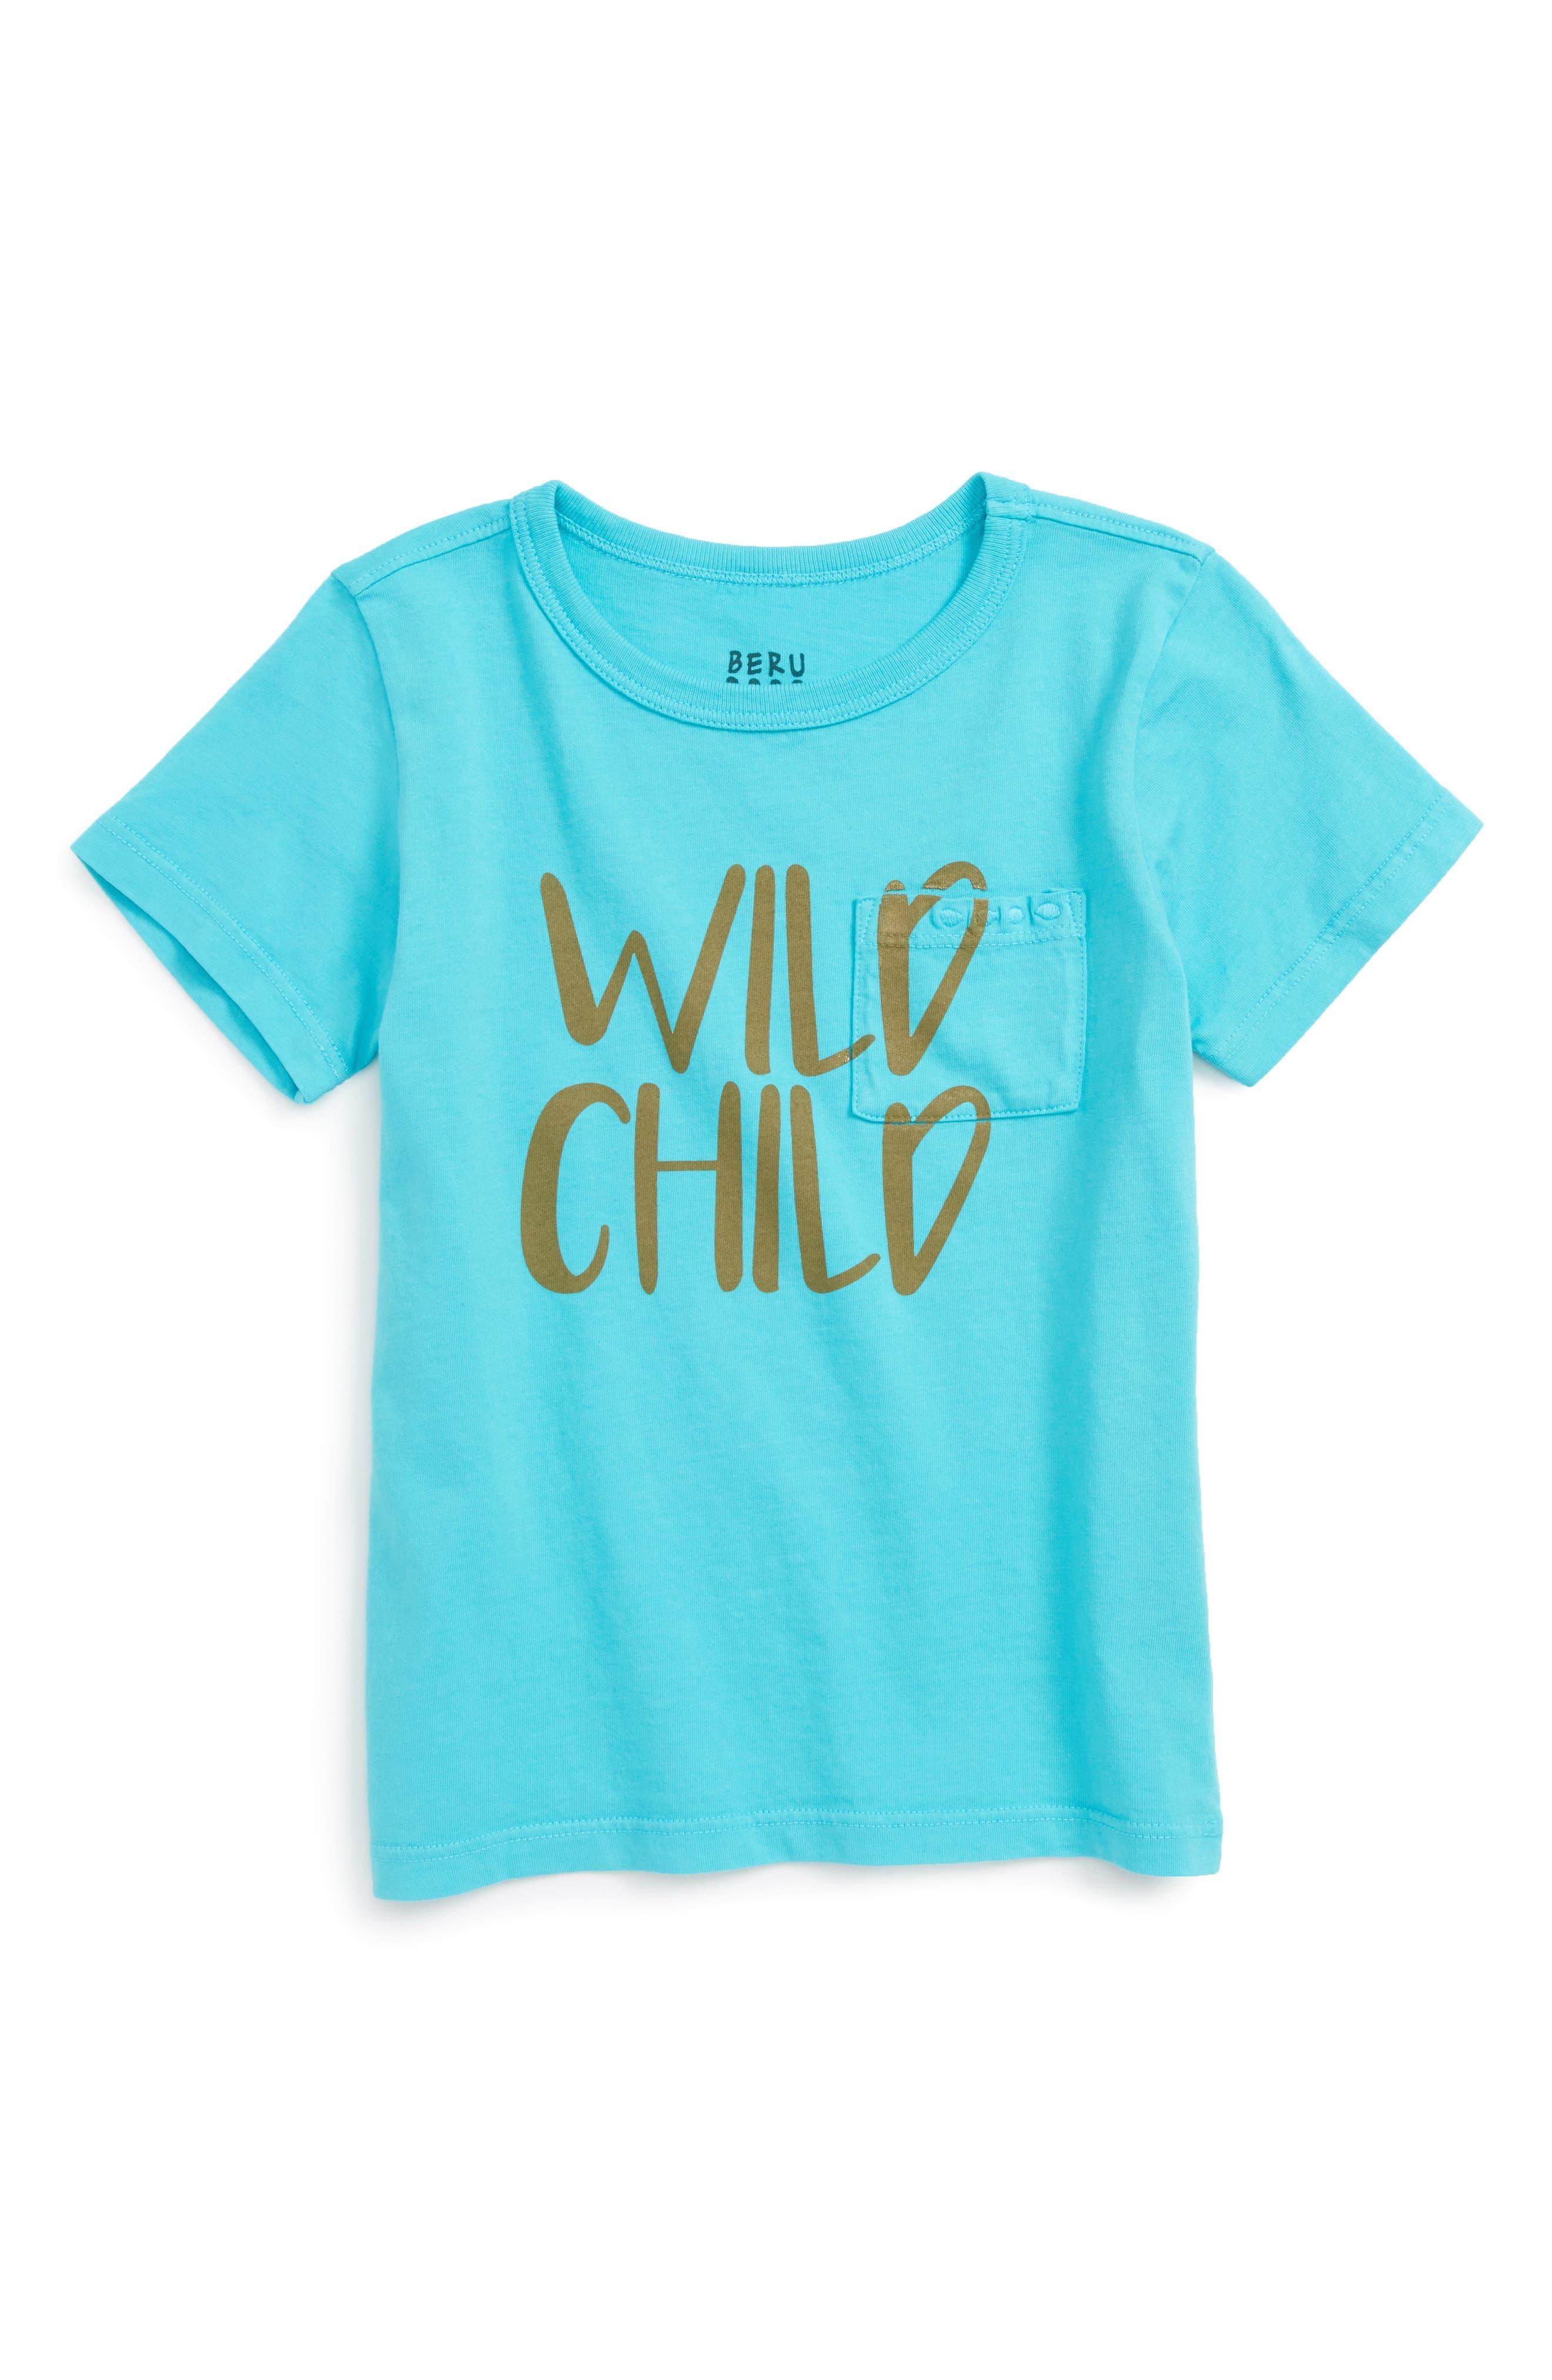 BERU Wild Child Organic Cotton Tee (Toddler Boys & Little Boys)